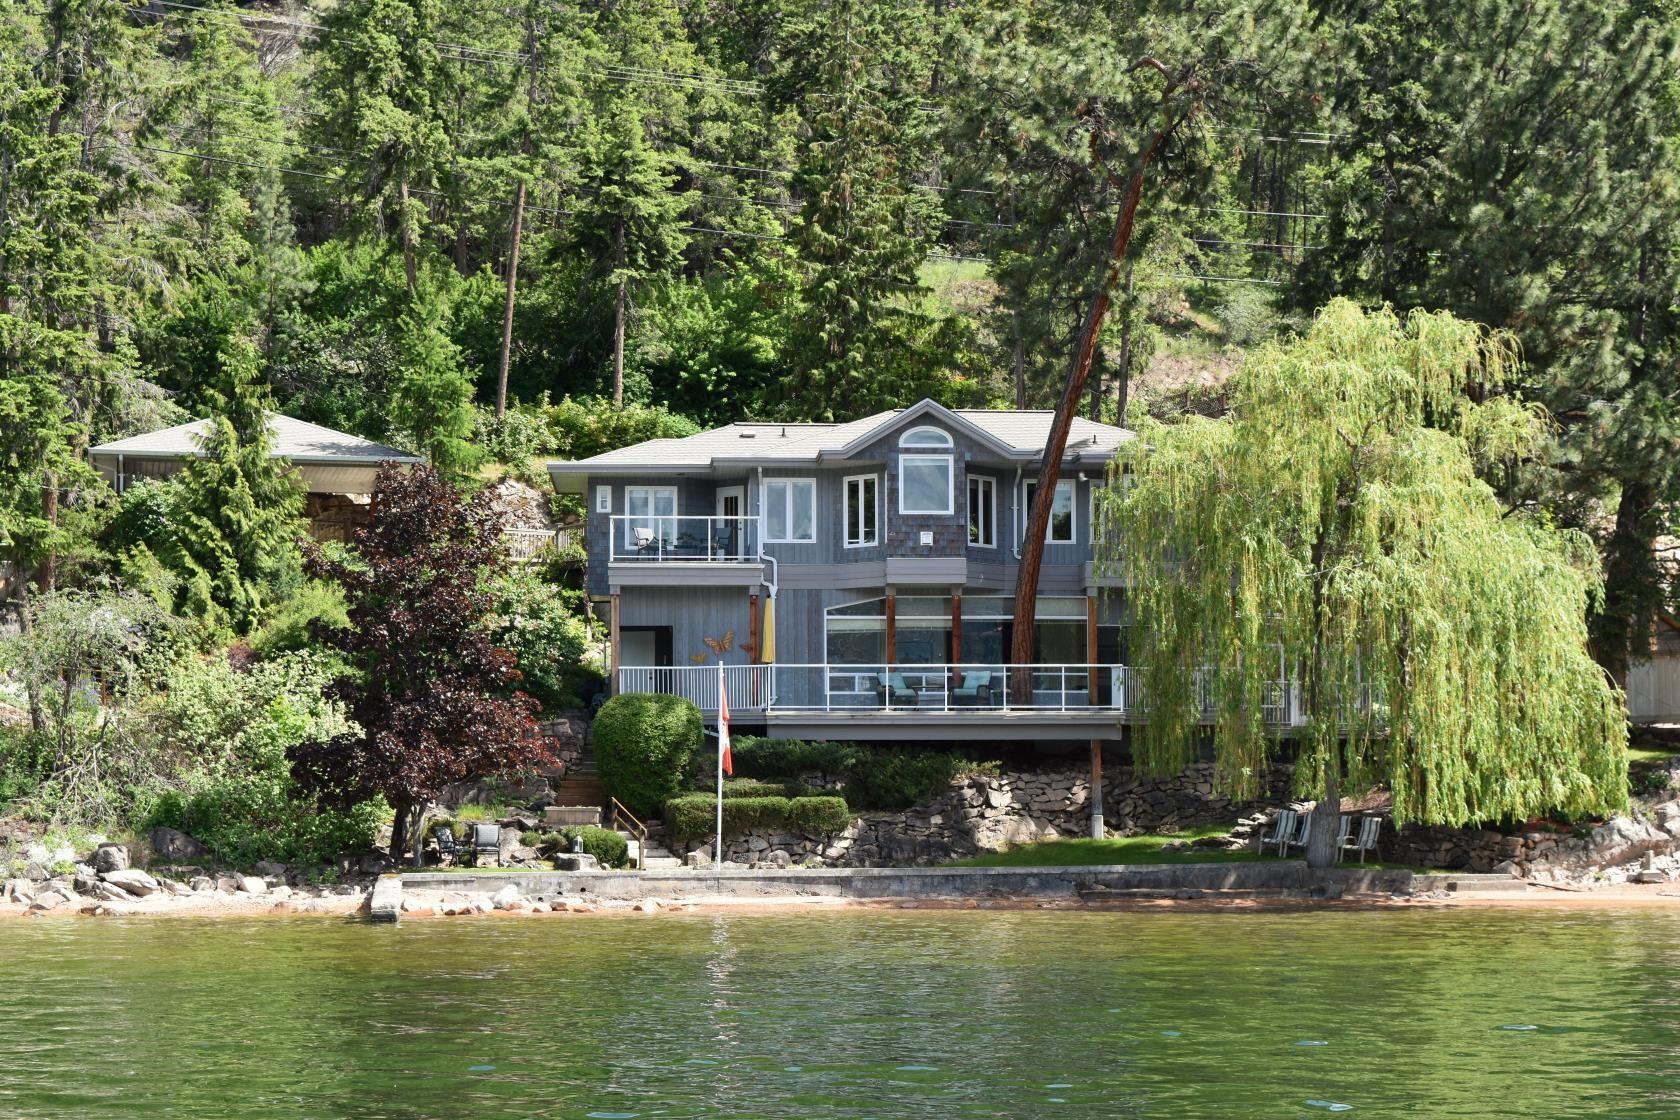 Main Photo: 9471 Eastside Road in Vernon: Okanagan Landing House for sale (North Okanagan)  : MLS®# 10116960